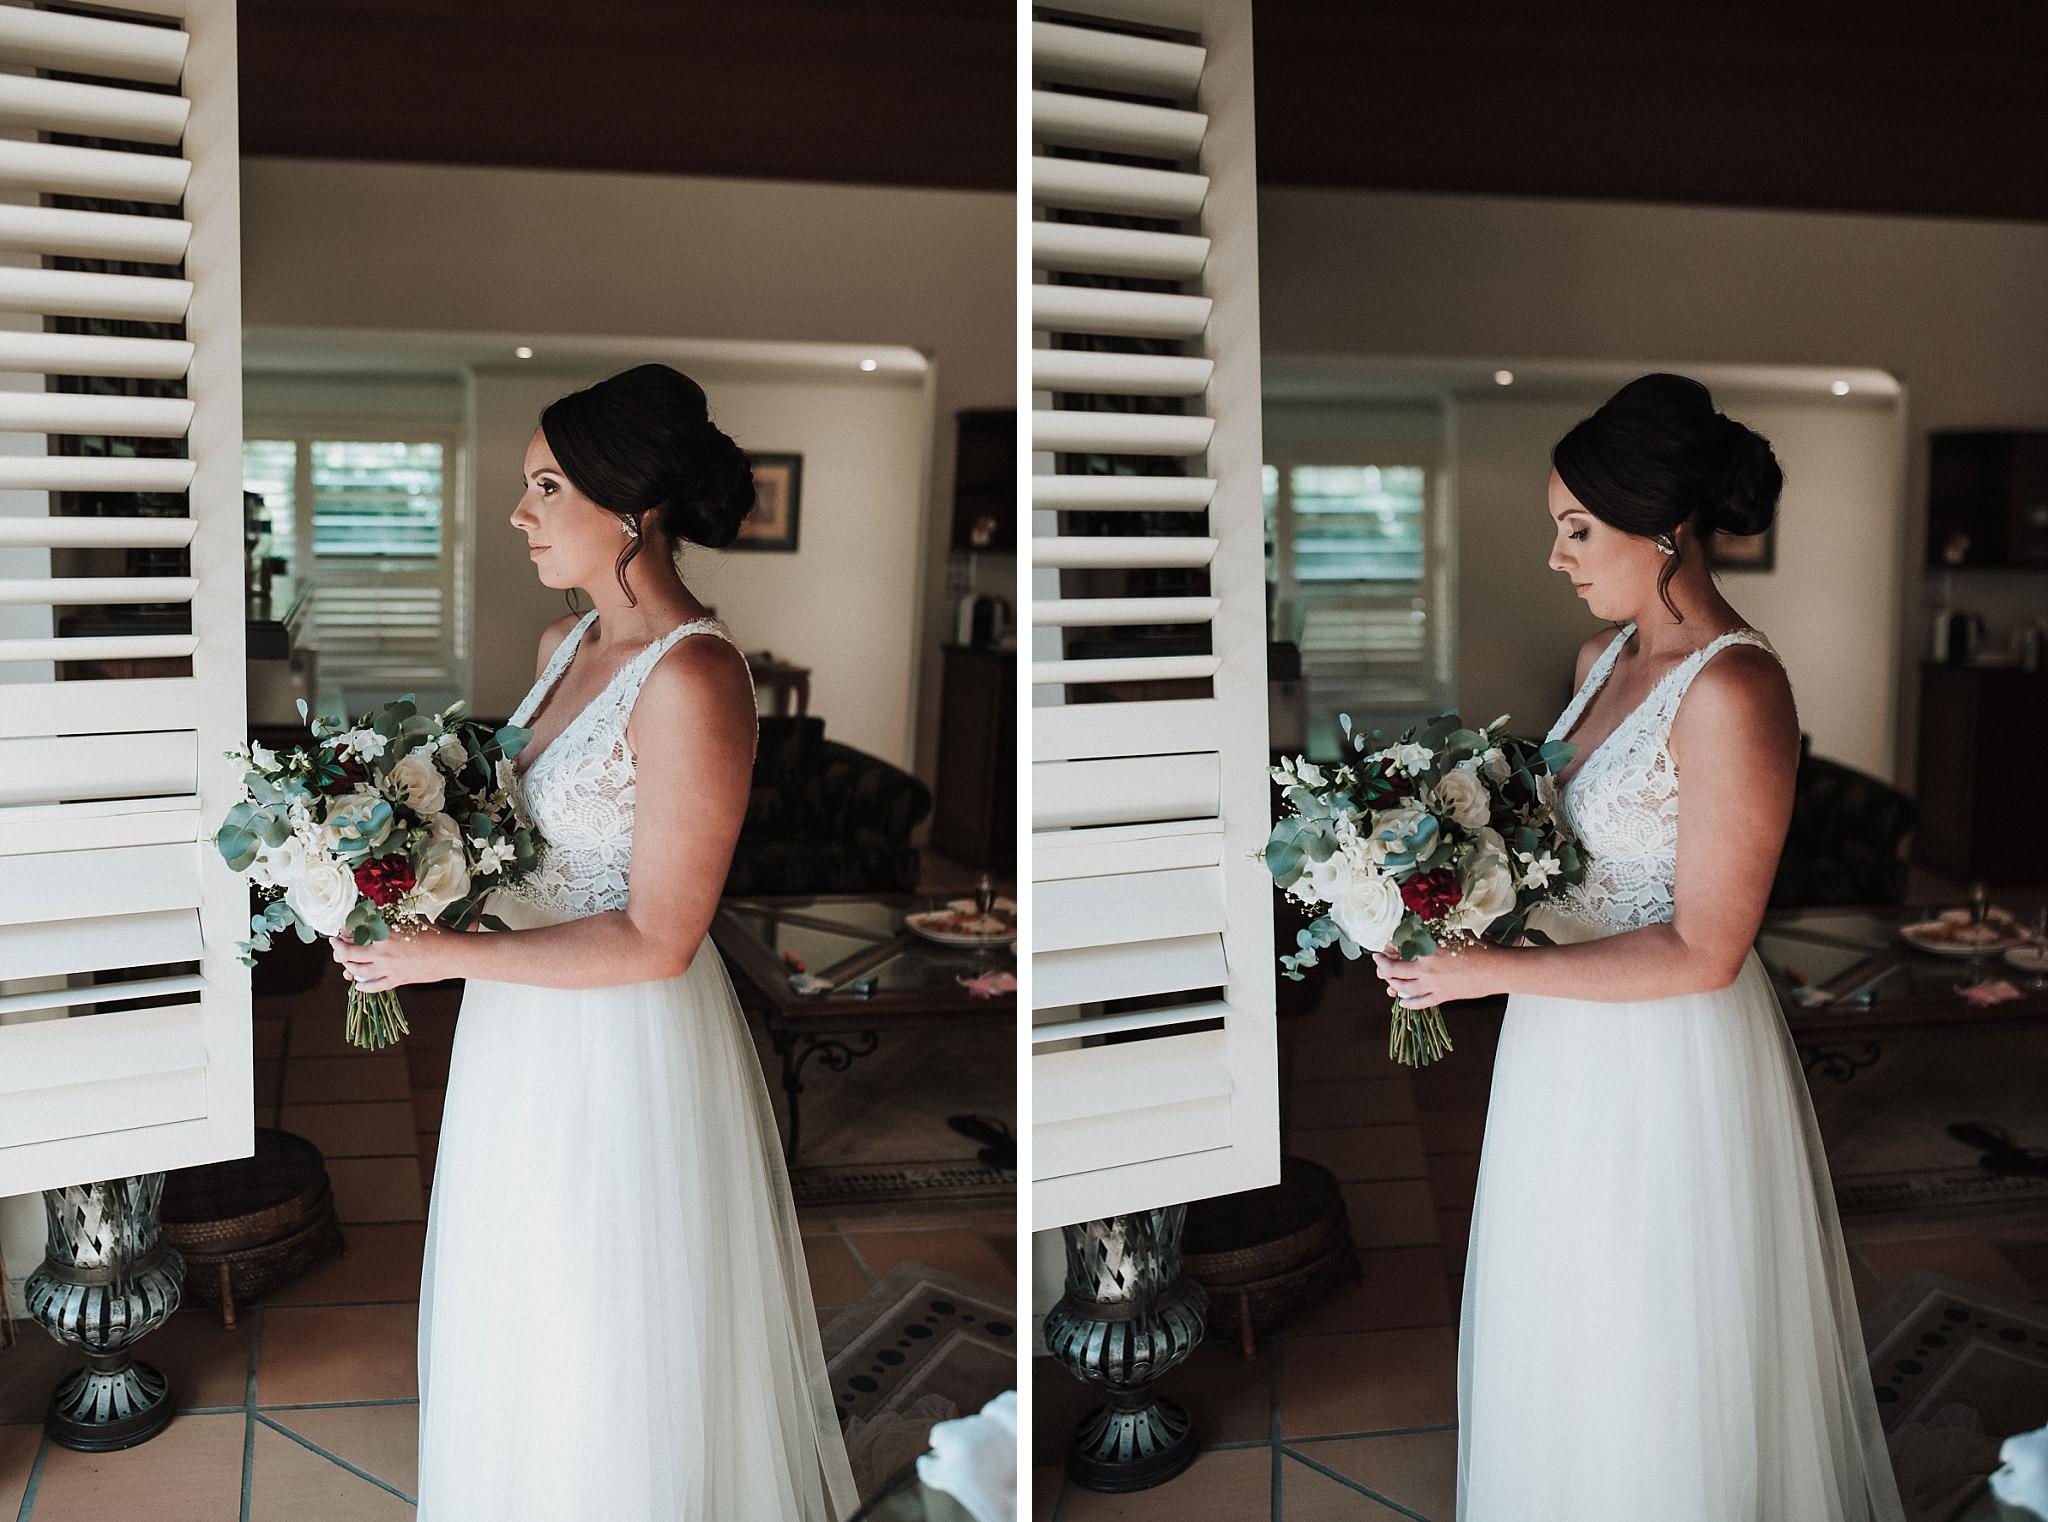 MECURE-RESORT-WEDDING-KING-965_BLOG-1.jpg